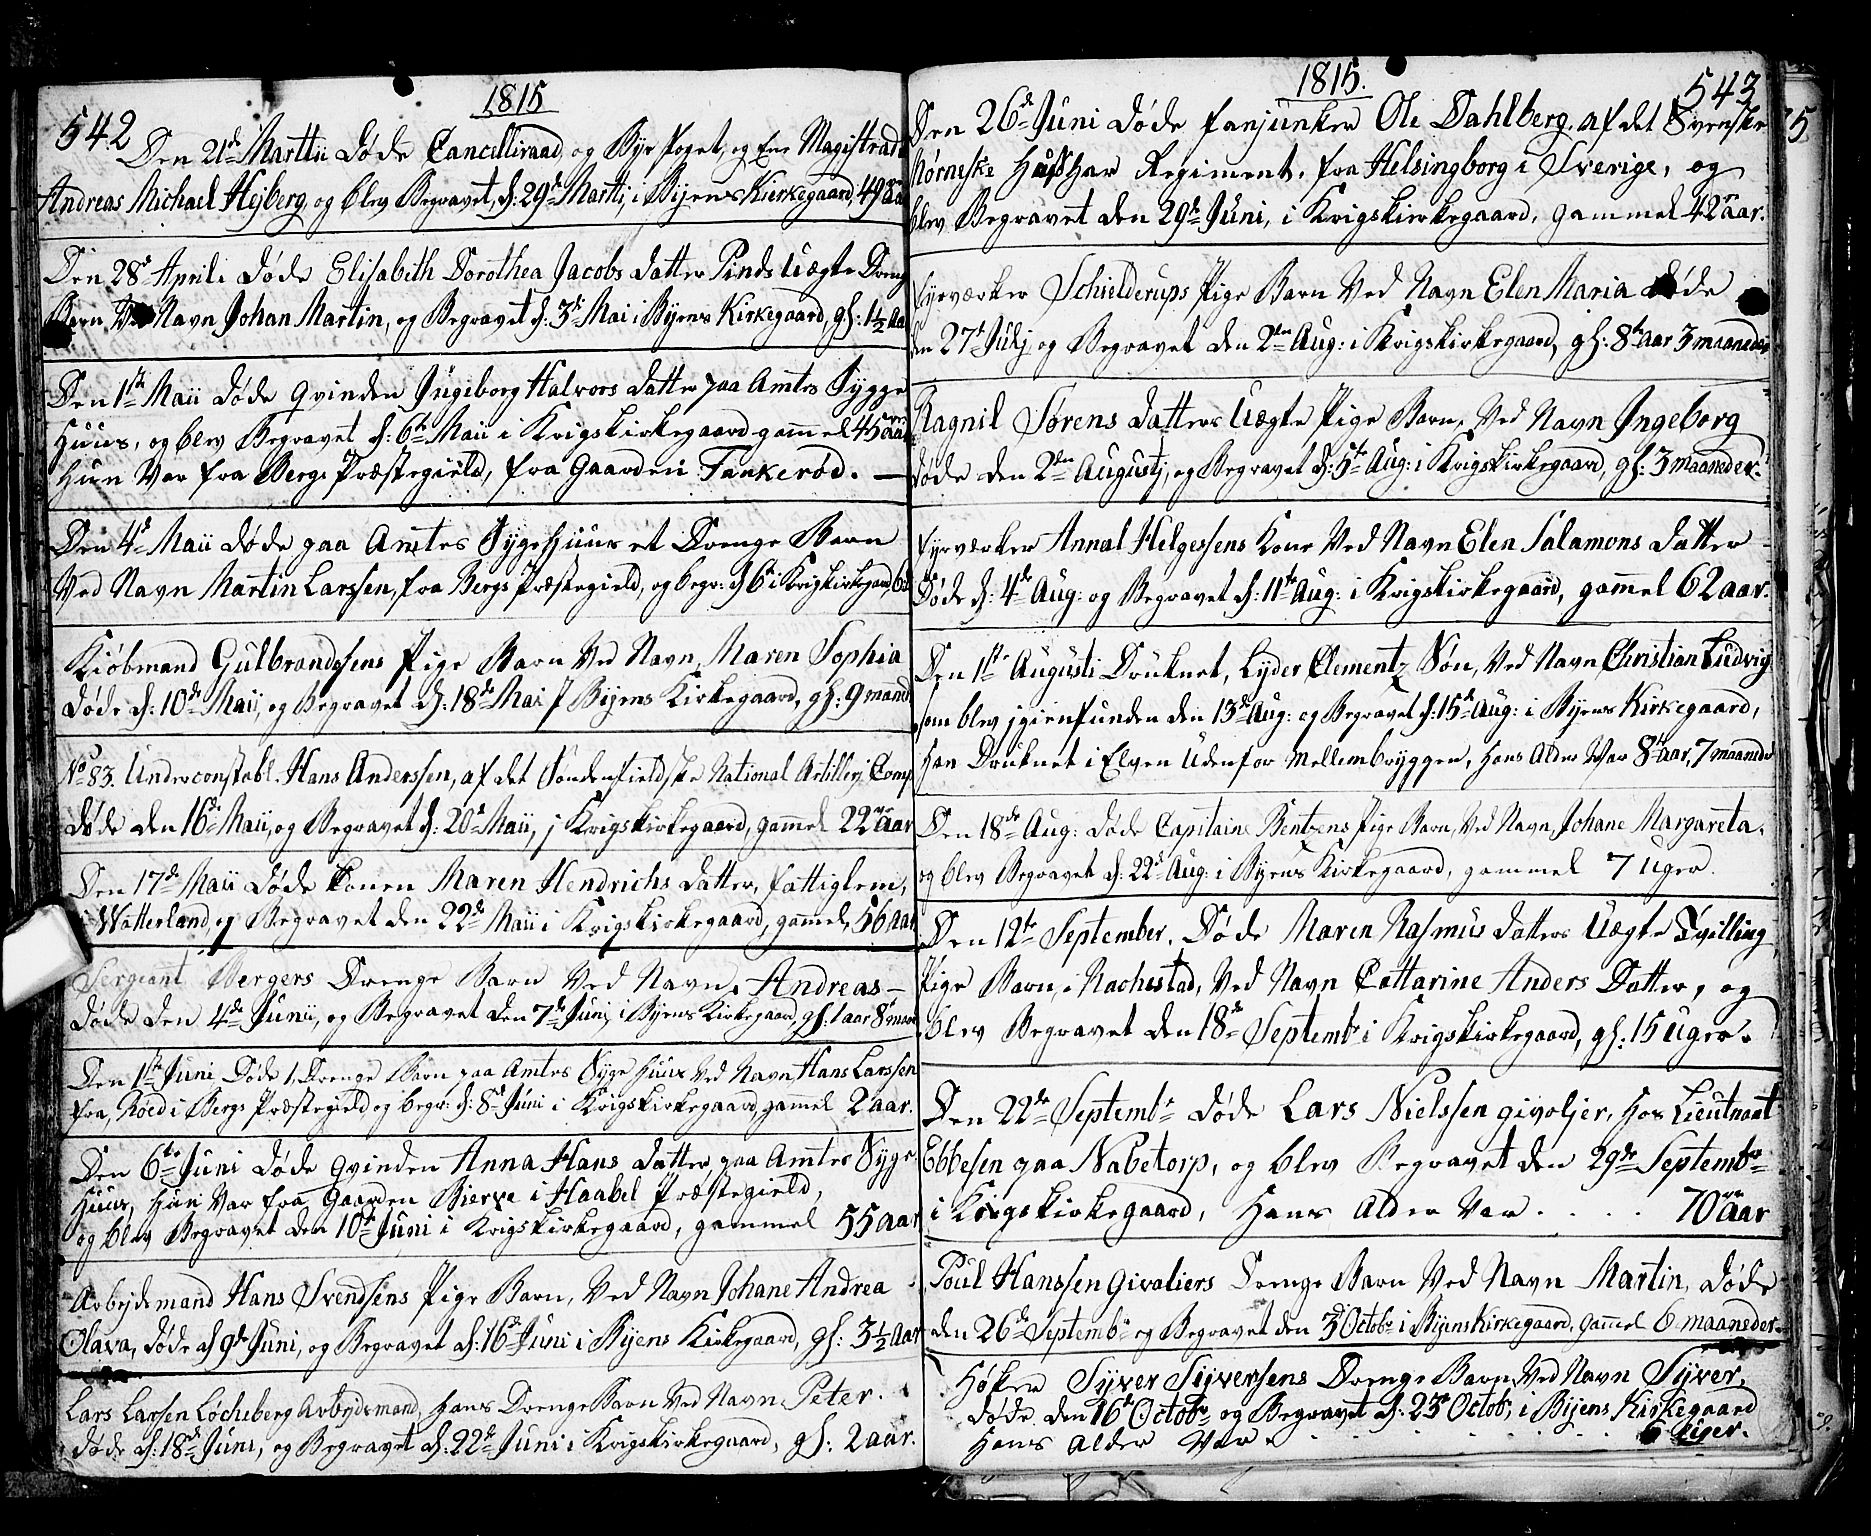 SAO, Fredrikstad prestekontor Kirkebøker, F/Fa/L0003: Ministerialbok nr. 3, 1805-1816, s. 542-543